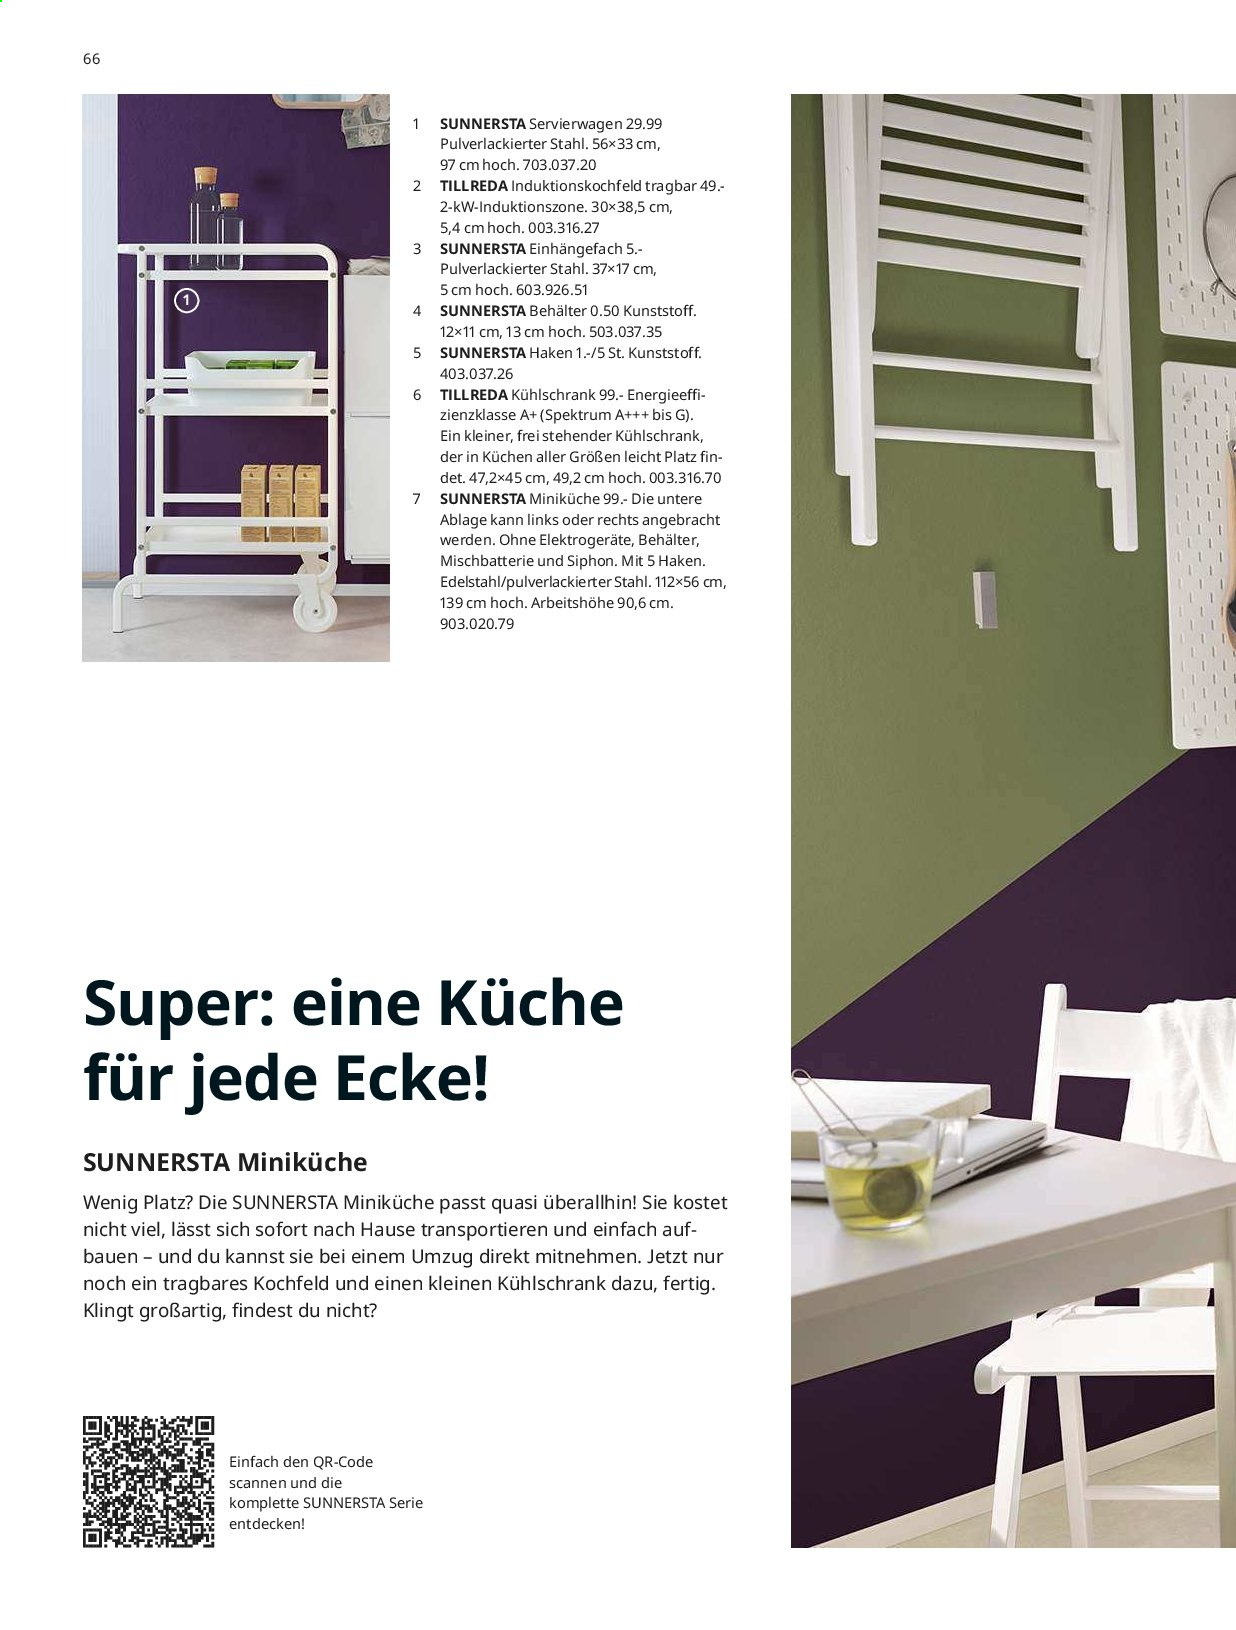 Full Size of Miniküche Ikea Aktuelles Prospekt 232020 3172020 Rabatt Kompass Betten 160x200 Mit Kühlschrank Küche Kosten Modulküche Sofa Schlaffunktion Kaufen Bei Wohnzimmer Miniküche Ikea